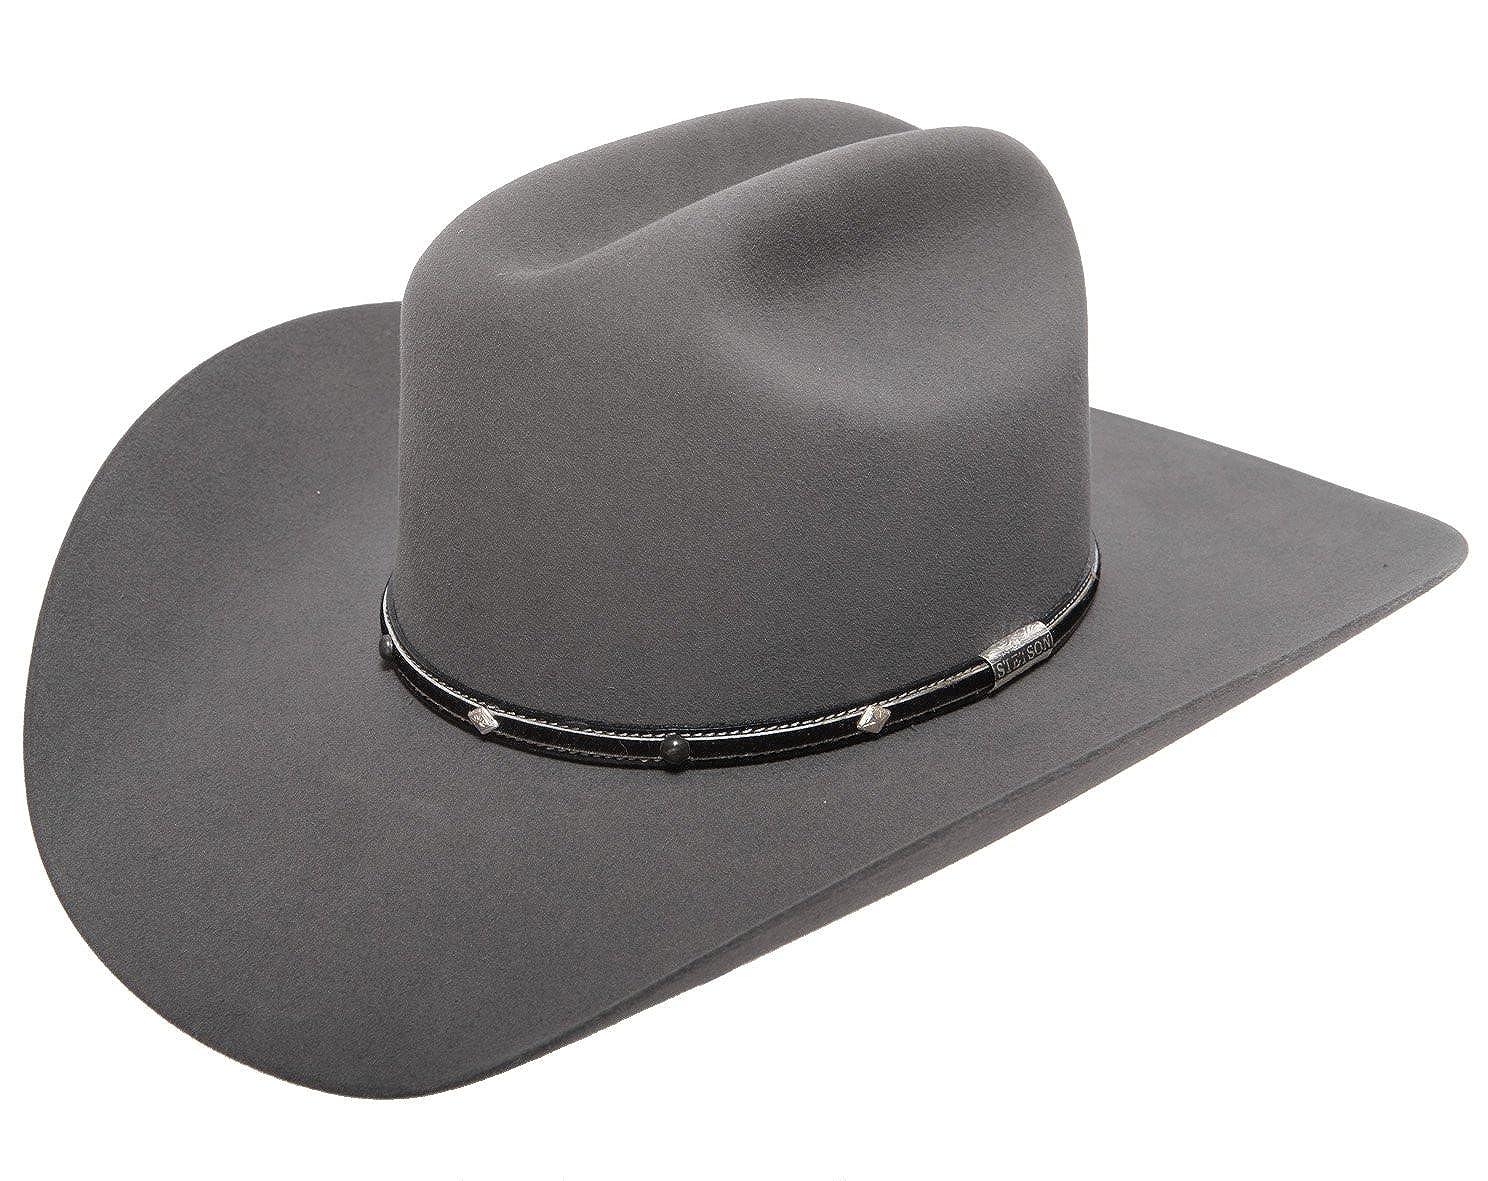 5ae8ce7ae5a Stetson Men s Angus 6X Fur Felt Cowboy Hat at Amazon Men s Clothing store  Cowboy  Hats